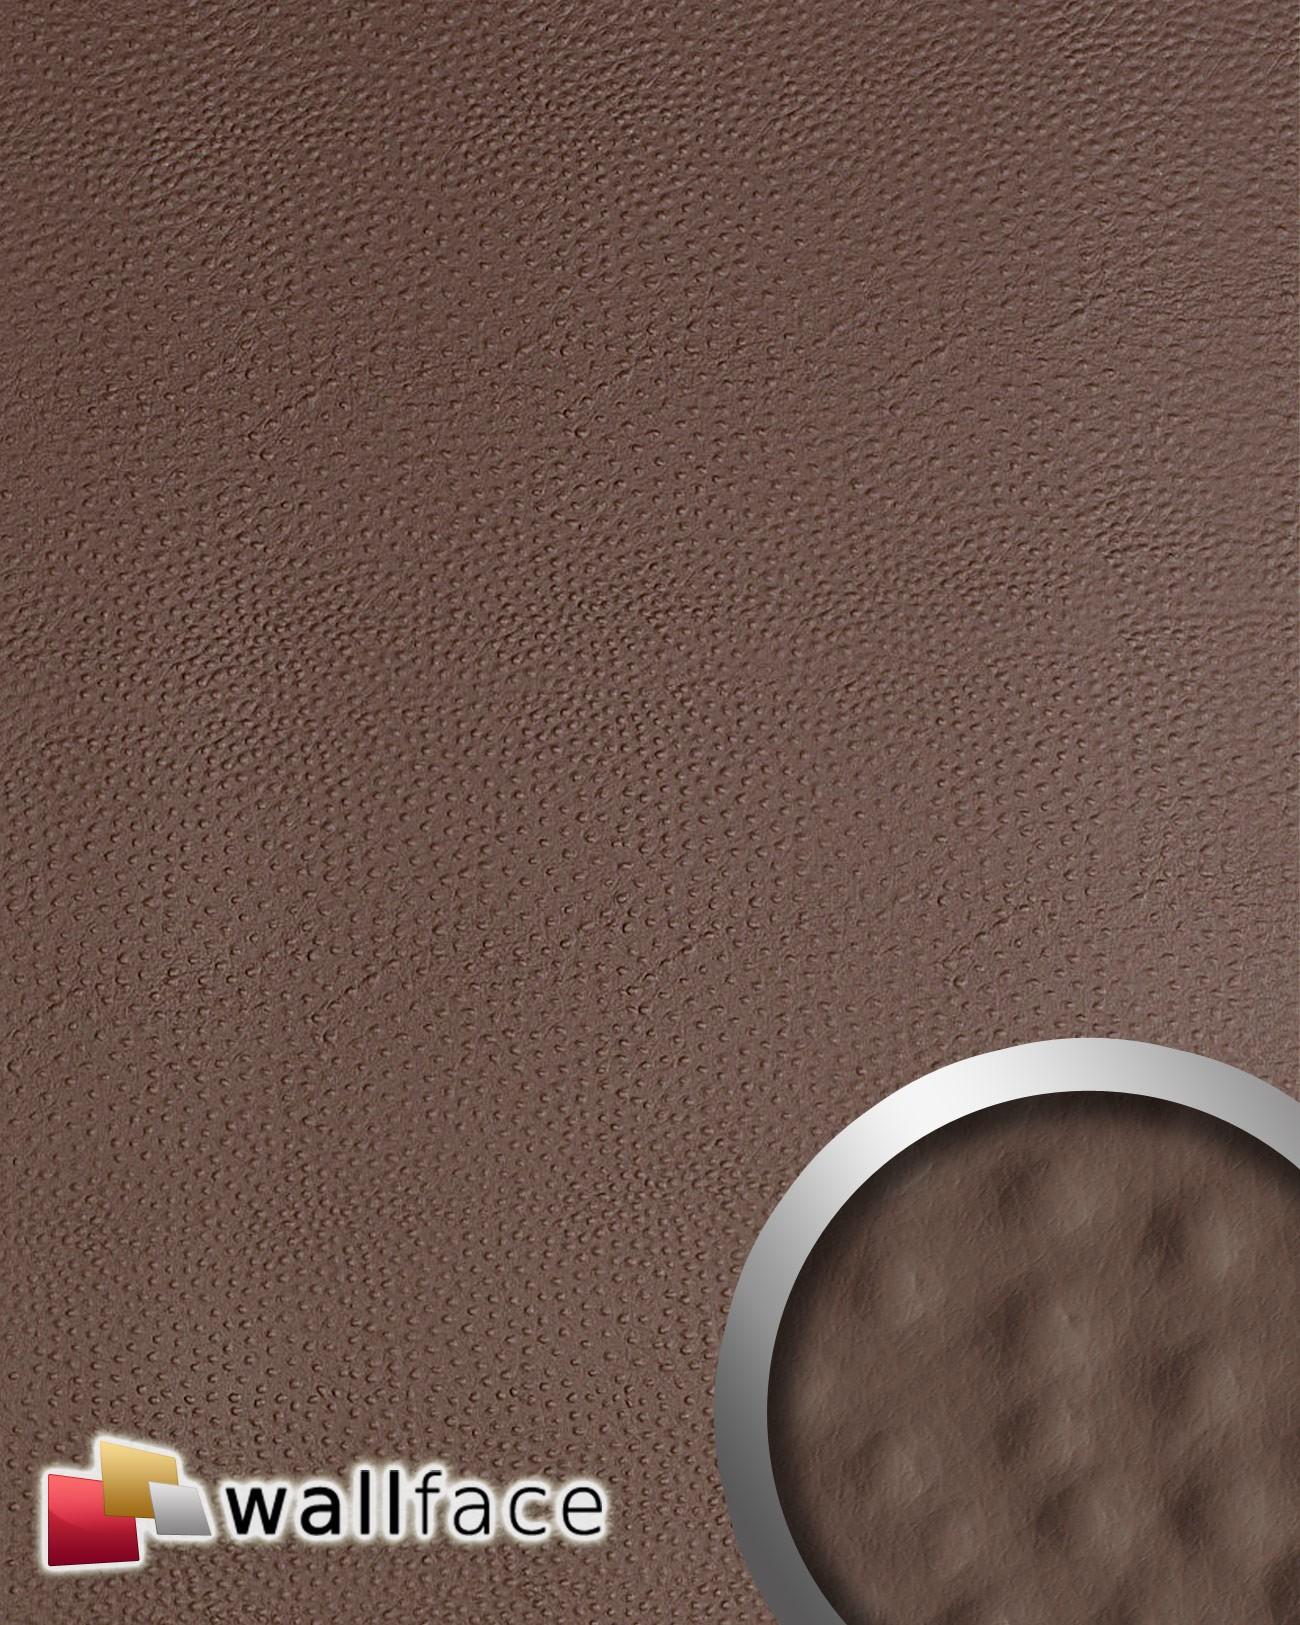 Panou Decorativ Leather 13403  Wallface  Autocolant